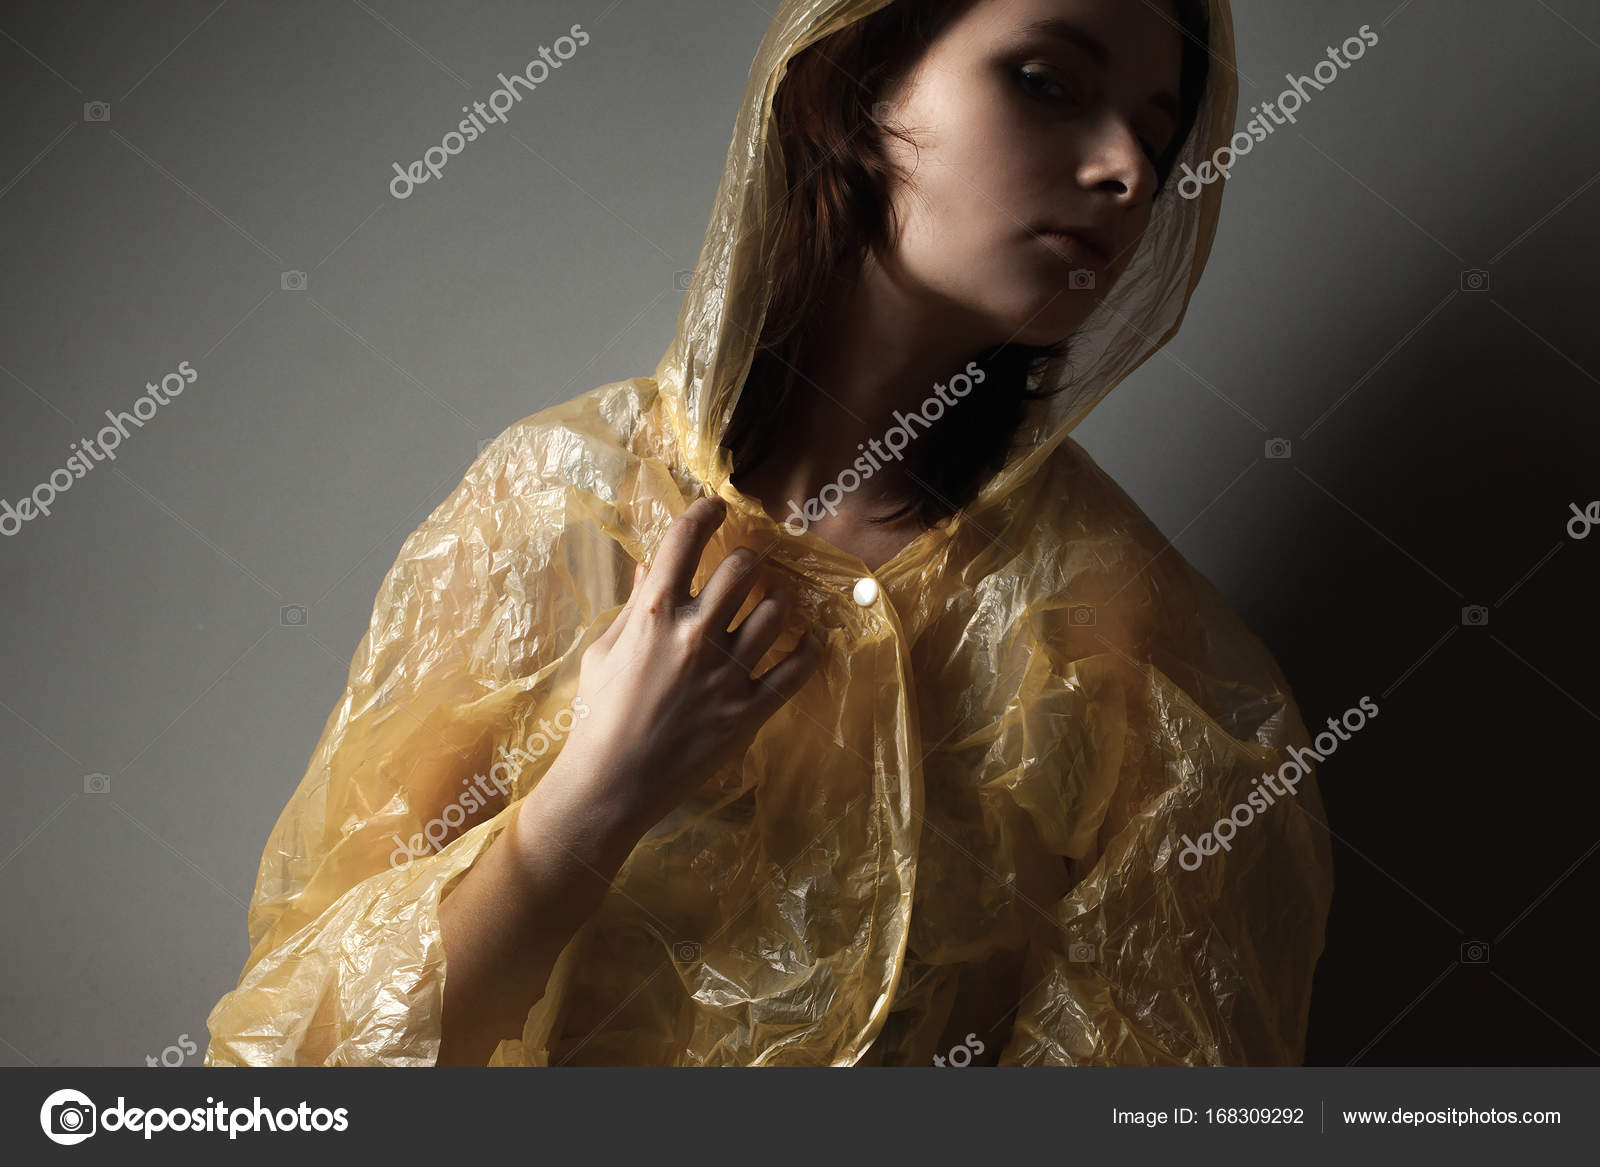 Im — Dima Junge © aslanian168309292 Frau Regenmantel Stockfoto cFKl1J